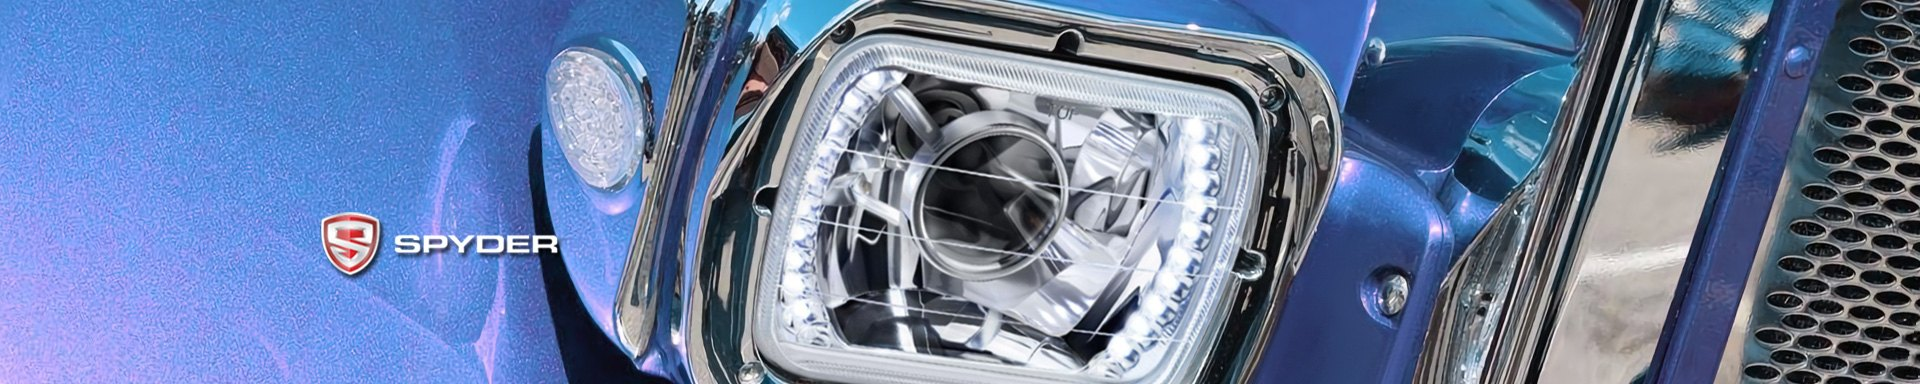 Spyder™   Semi Truck Headlights, Off-Road Lights, Emergency